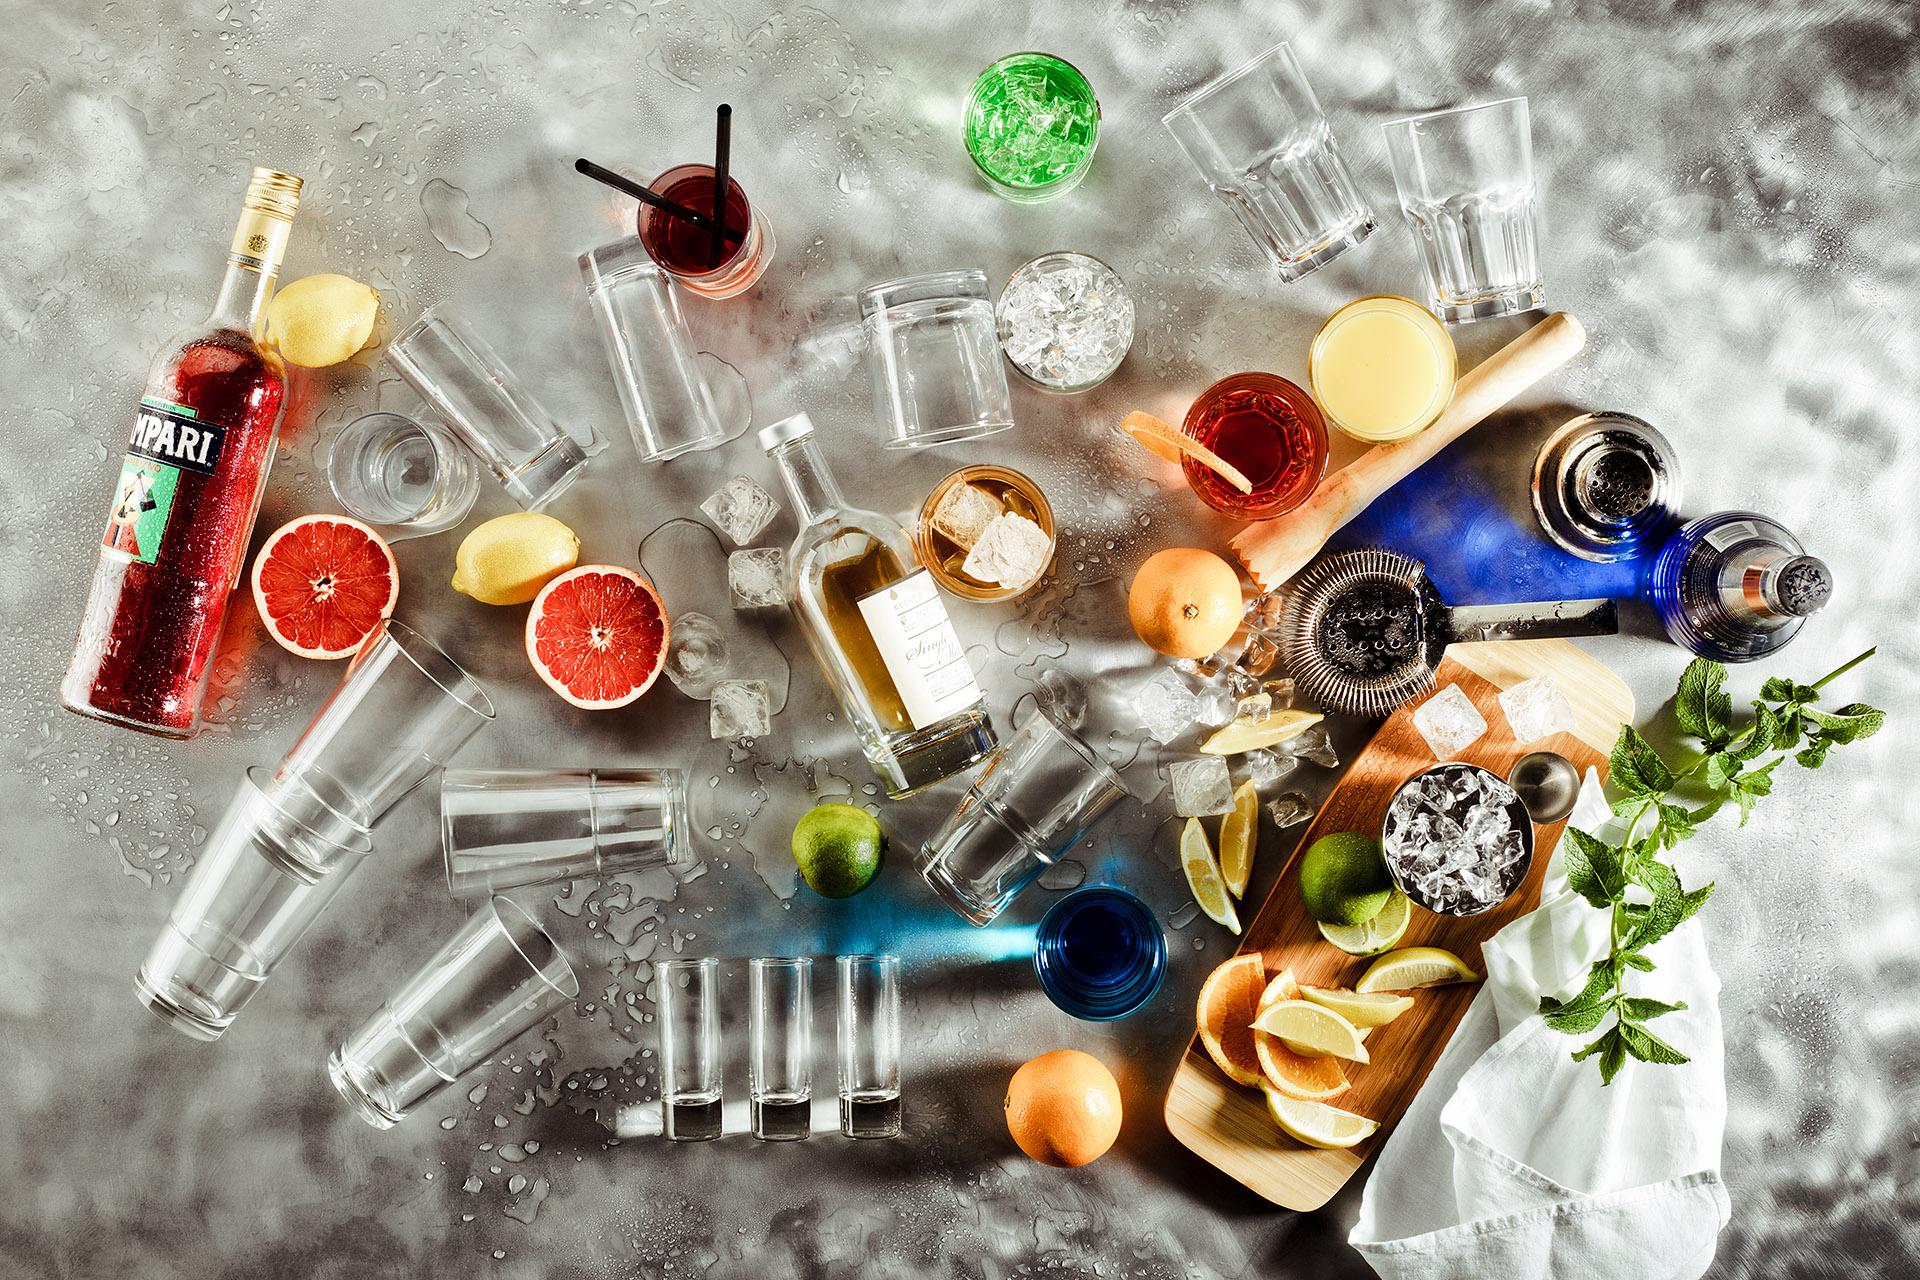 Cocktails & Drinks, fotografiert im Studio für Foodfotografie - Fotowerk Lampelmayer